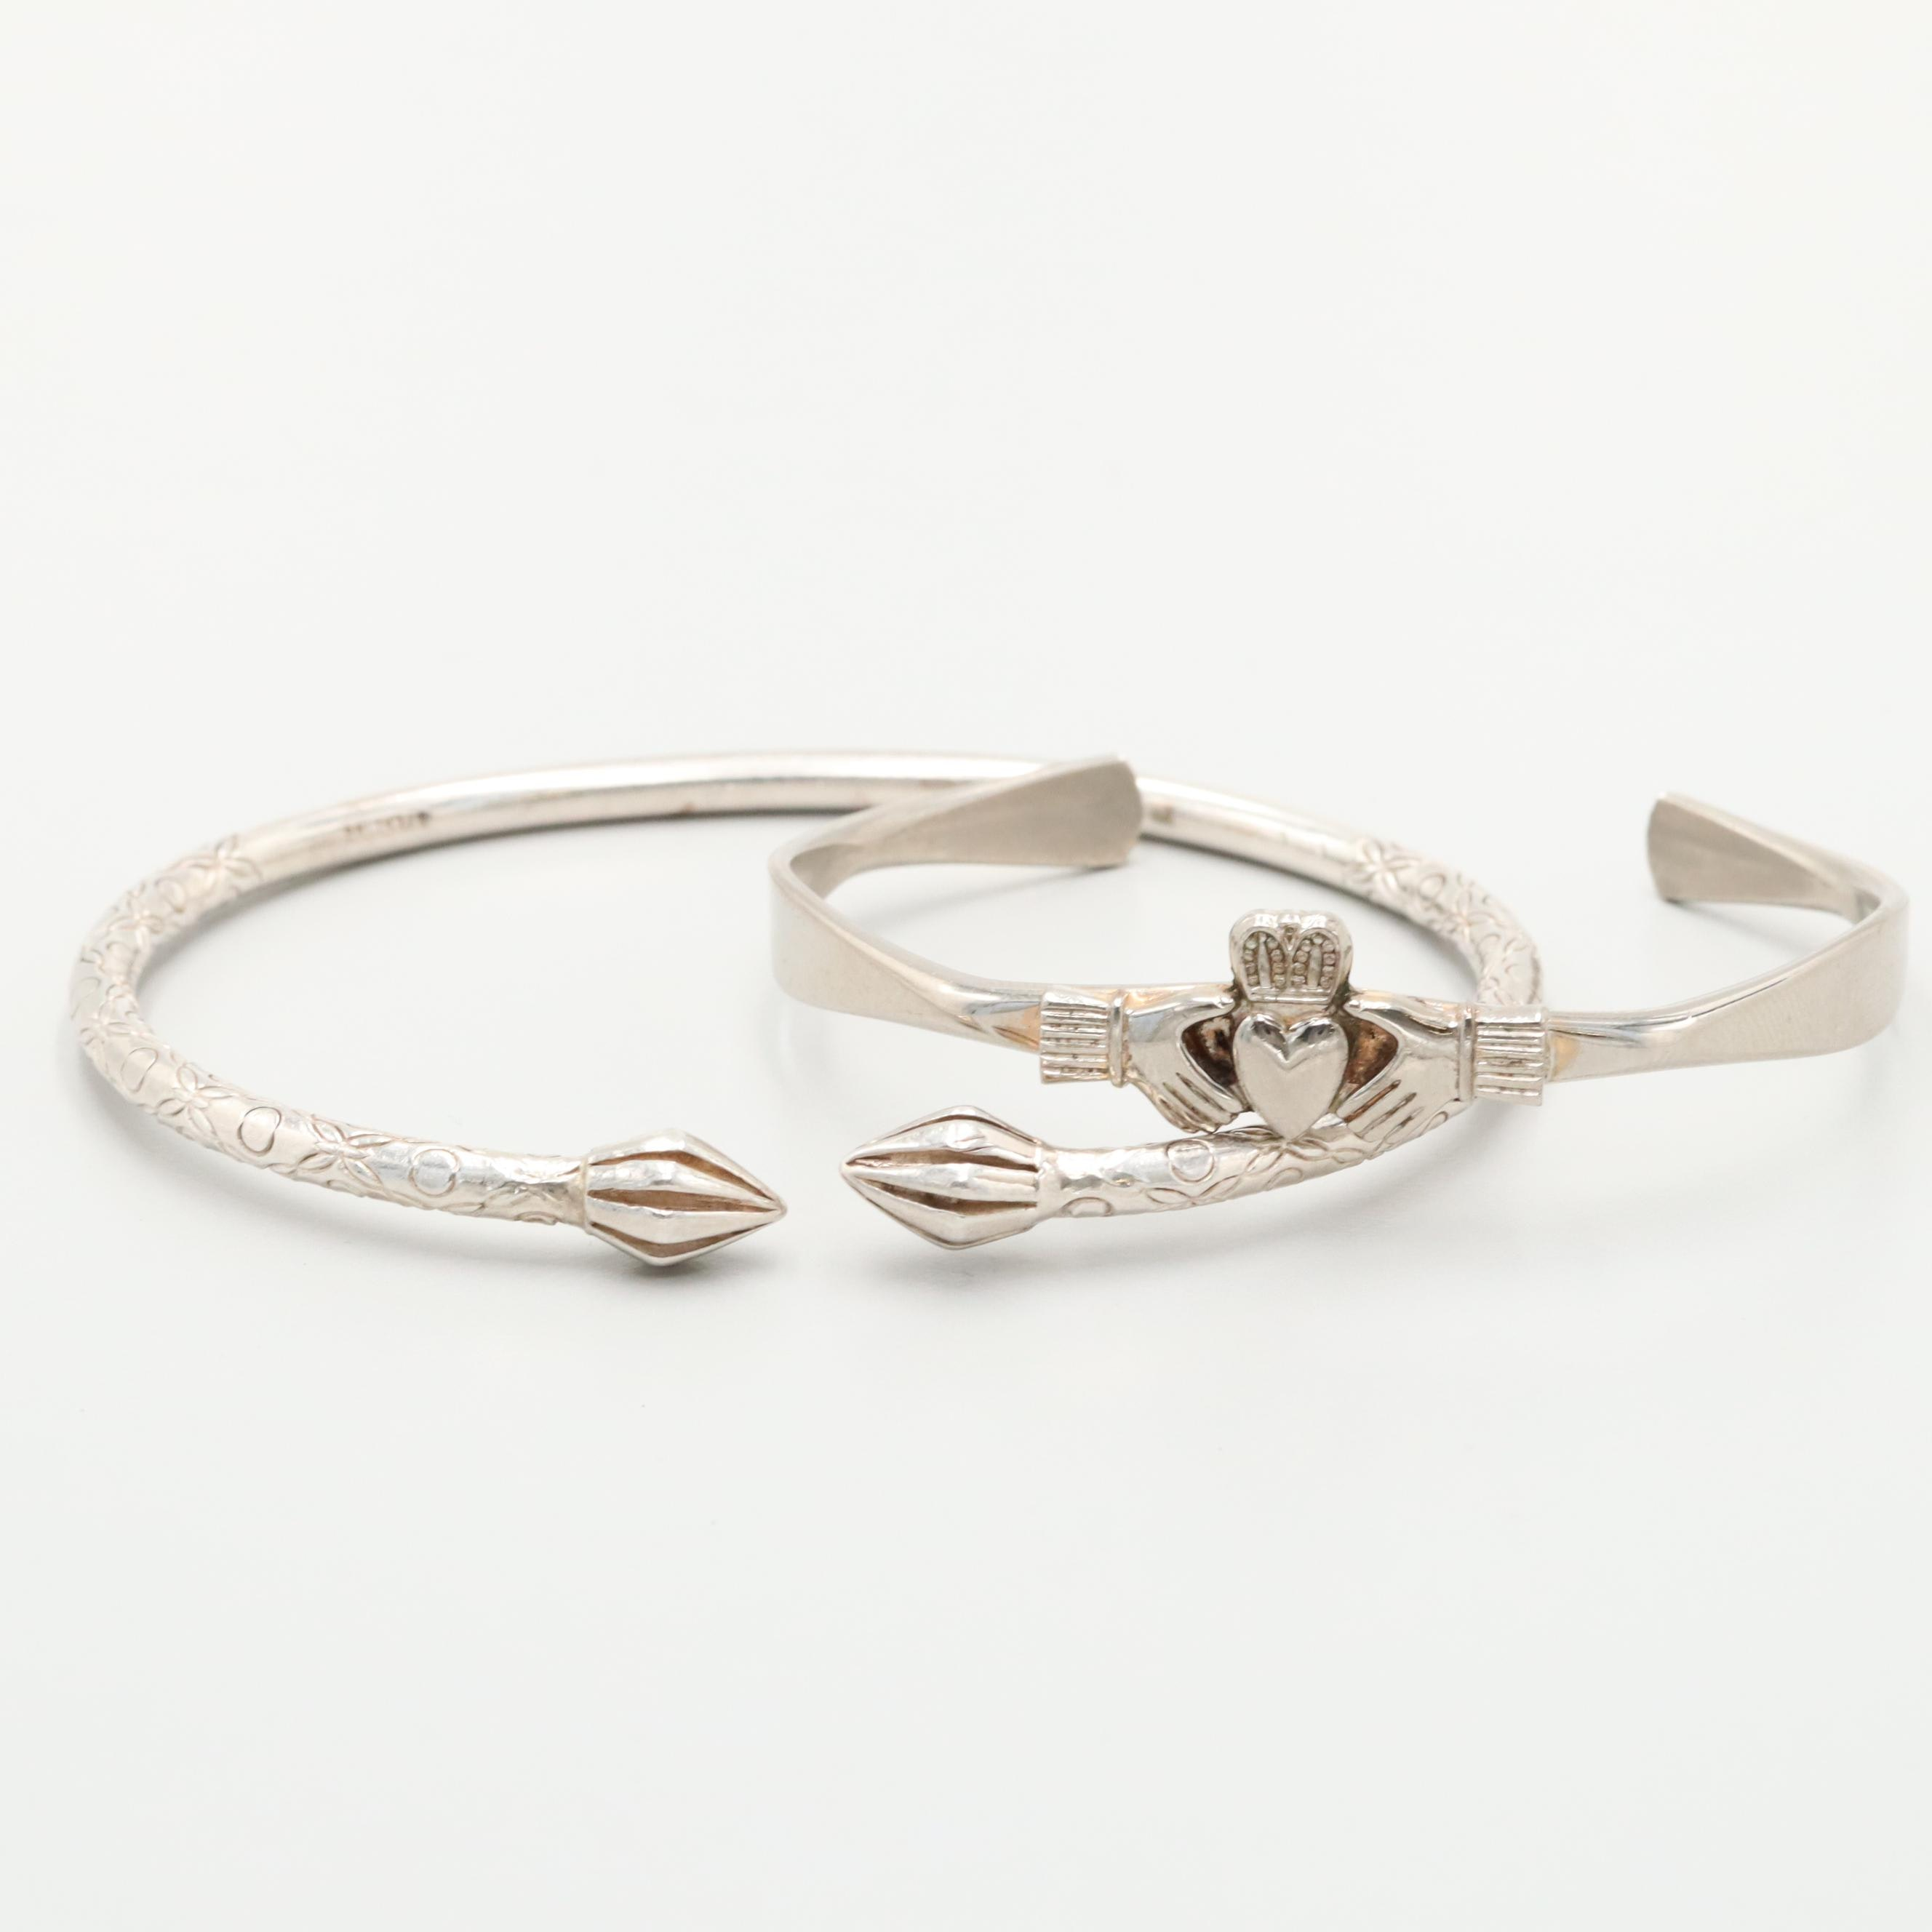 Sterling Silver Cuff Bracelet and Silver Tone Claddagh Cuff Bracelet